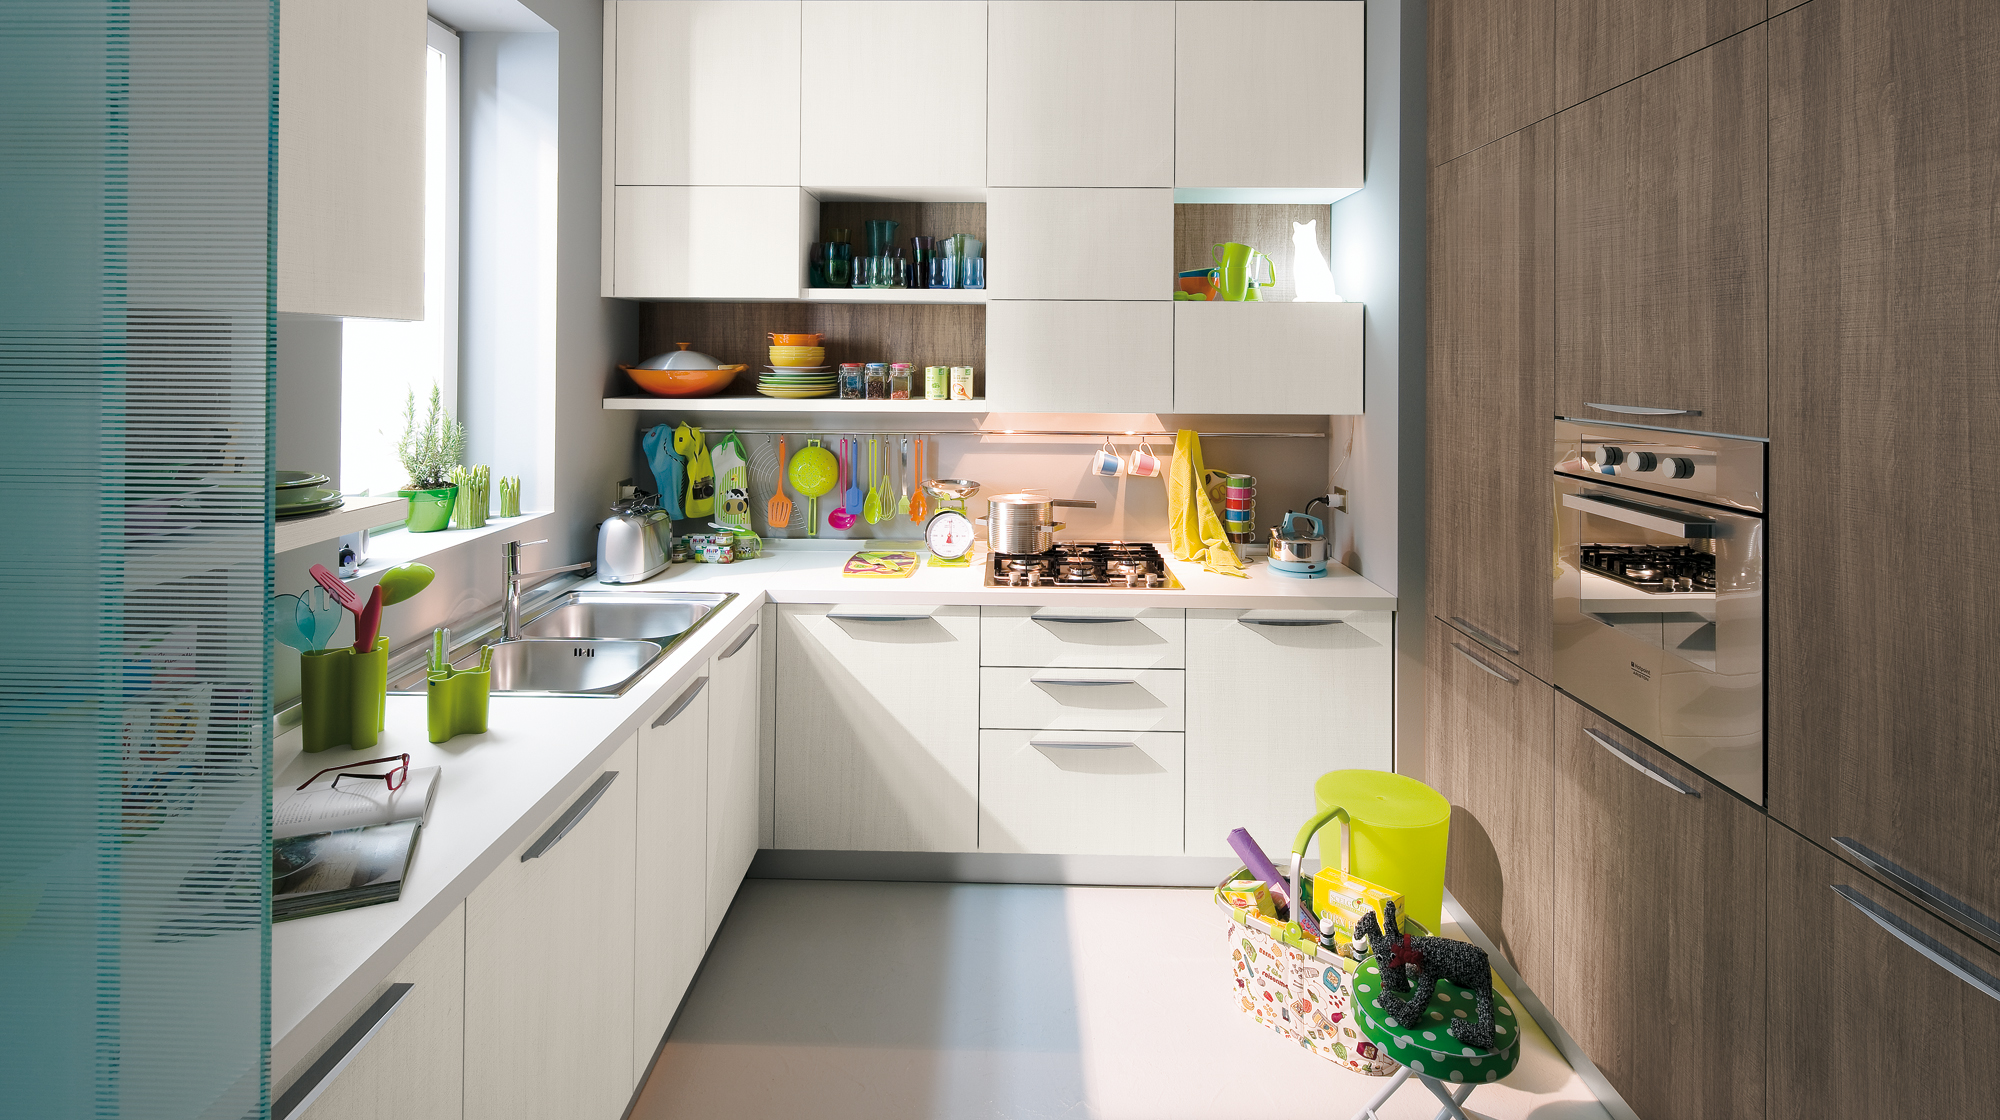 Veneta Cucine Start Time Mellera Arredamenti #ADA91E 2000 1120 Cucine Veneta